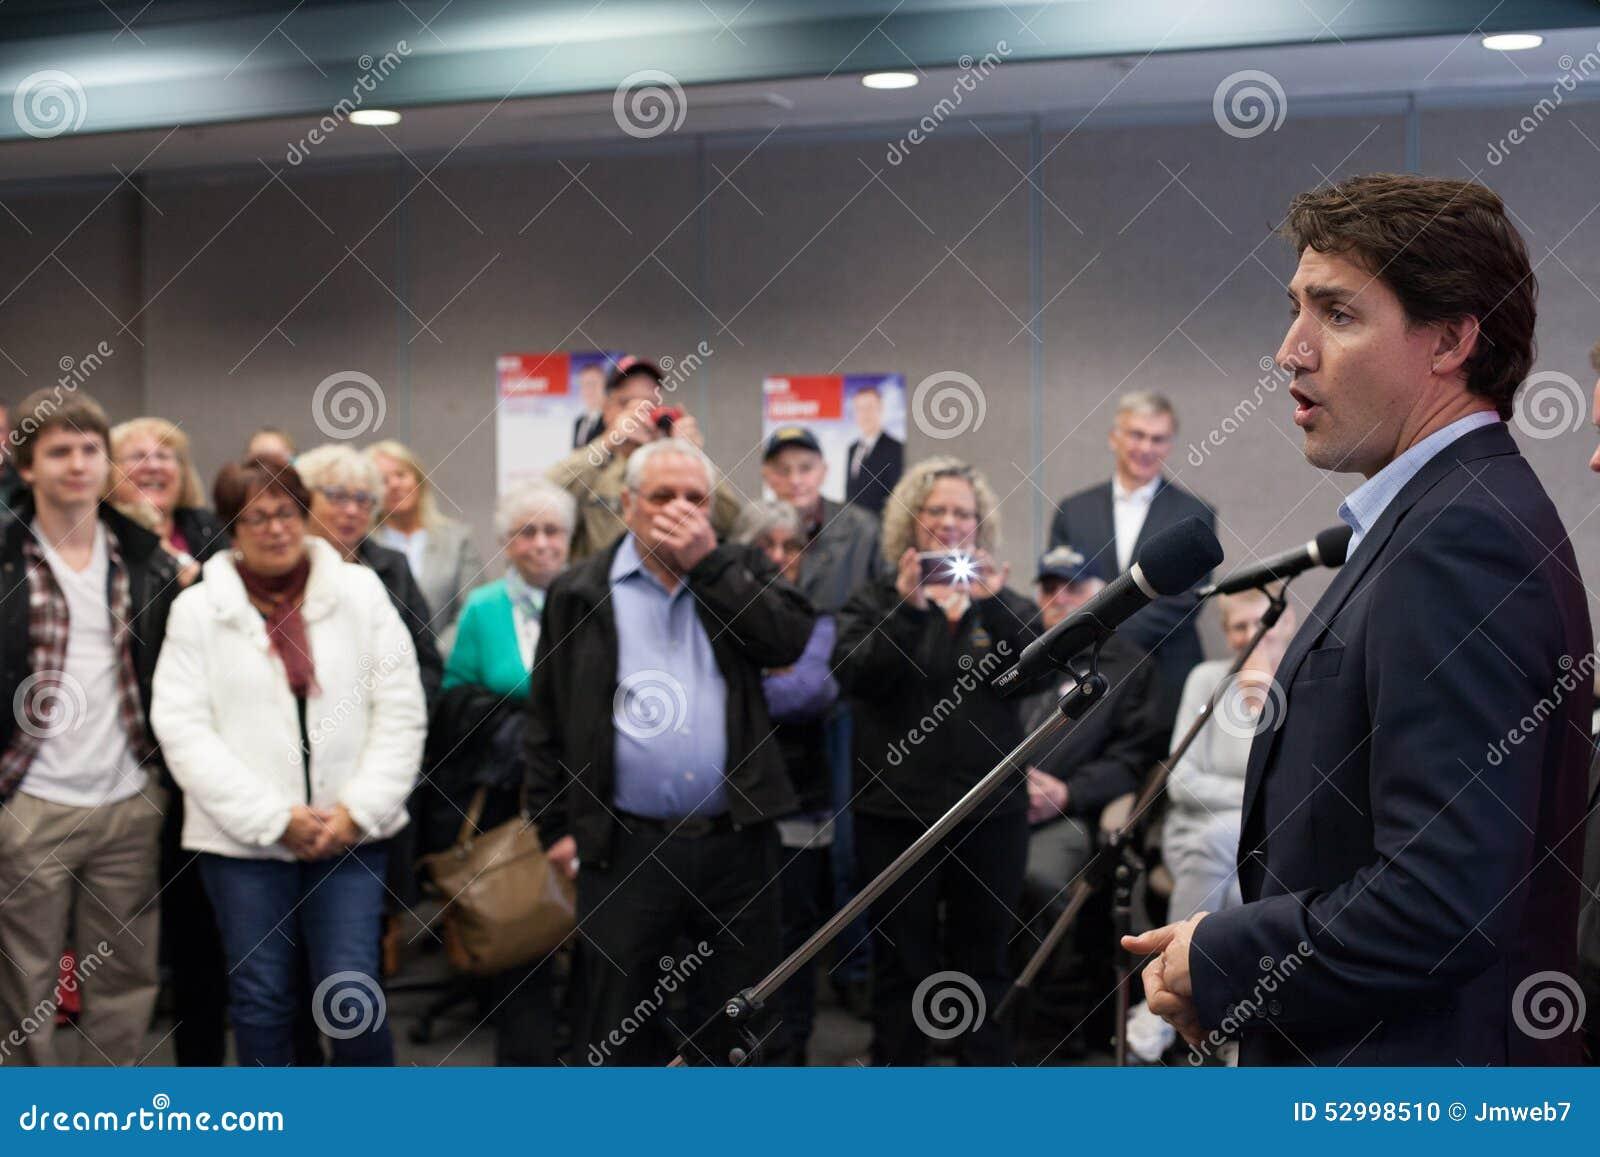 Canadian Liberal Leader Justin Trudeau